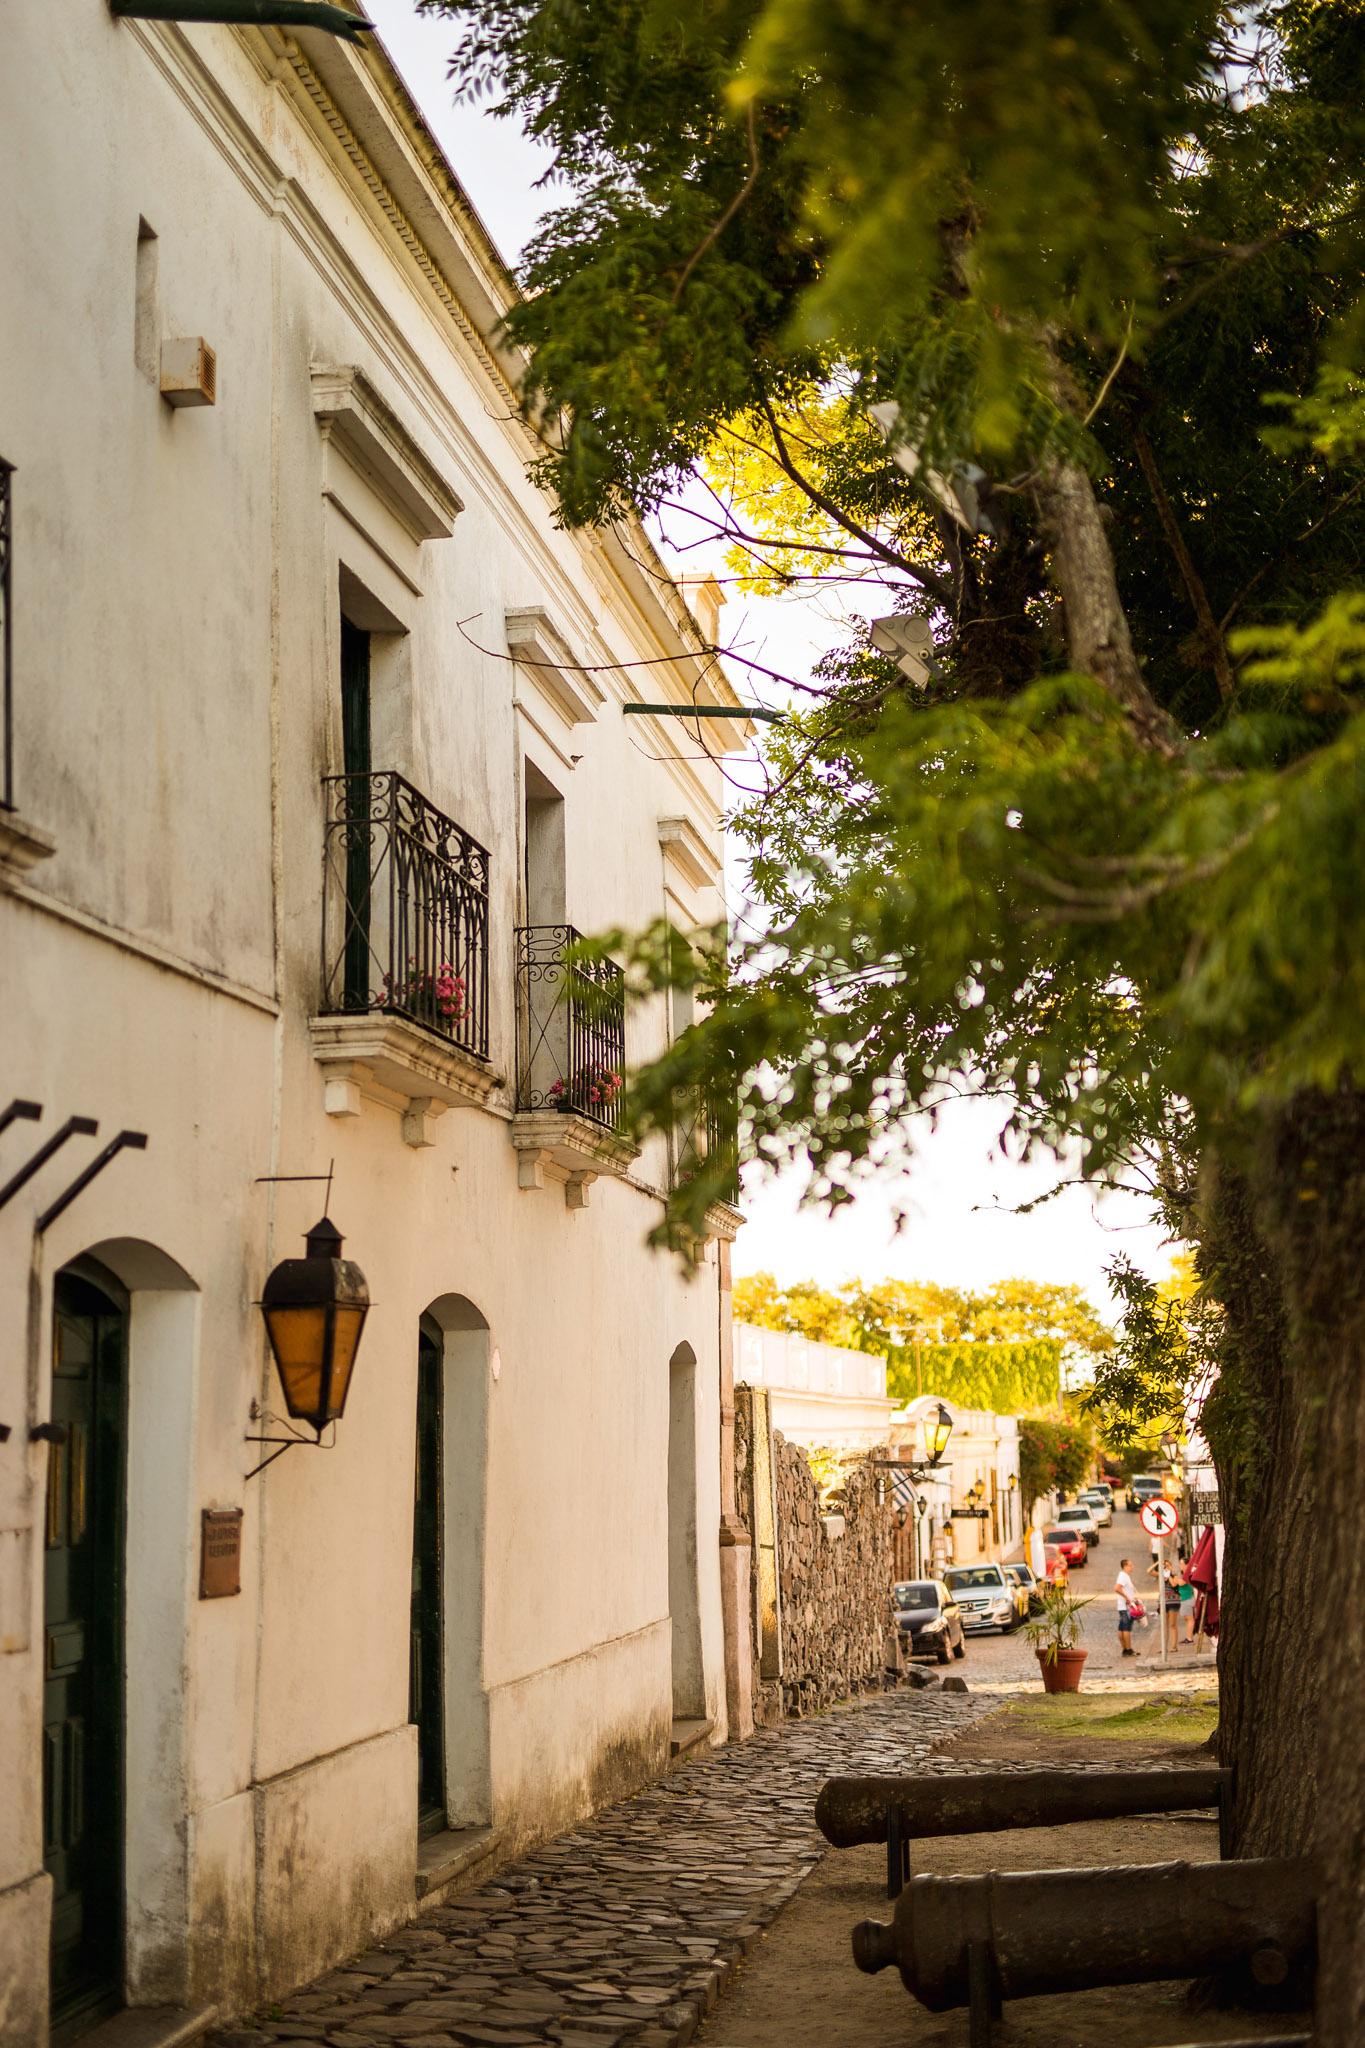 wedding-travellers-destination-photography-overlanding-south-america-uruguay-colonia-del-sacramento-balcony-street-house